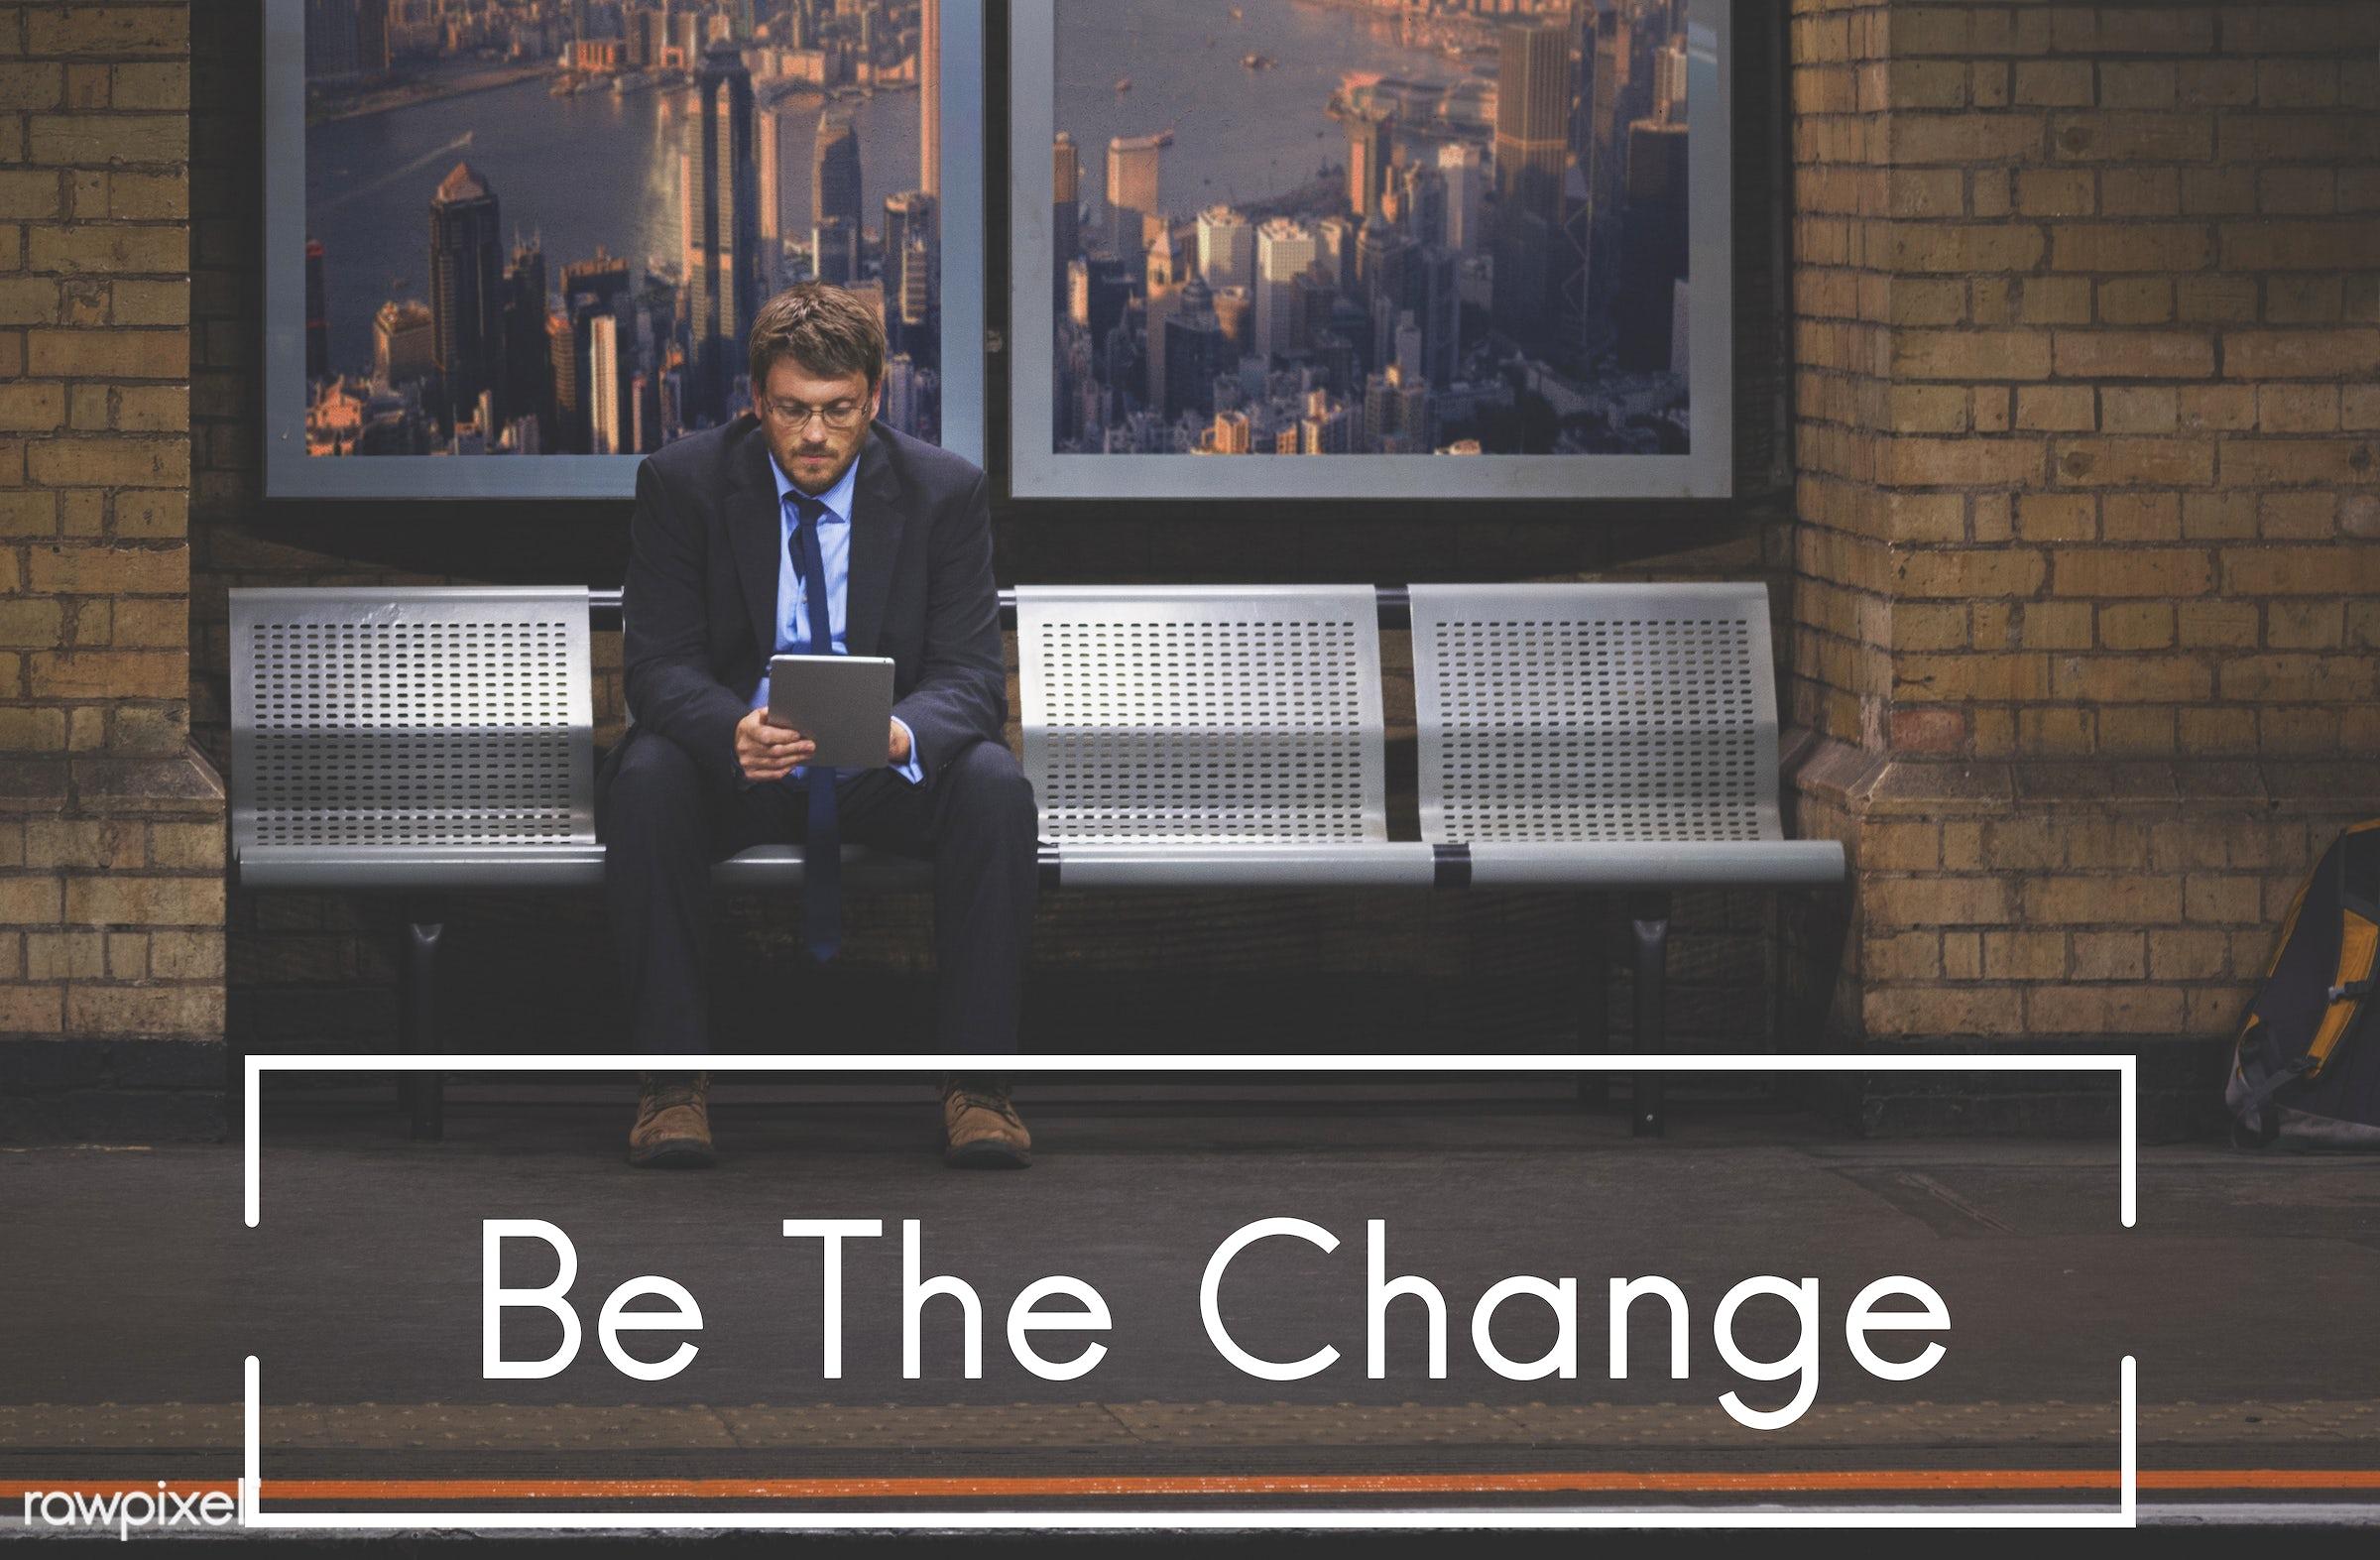 aspiration, be the change, business, businessmen, change, choice, creativity, development, device, different, digital,...